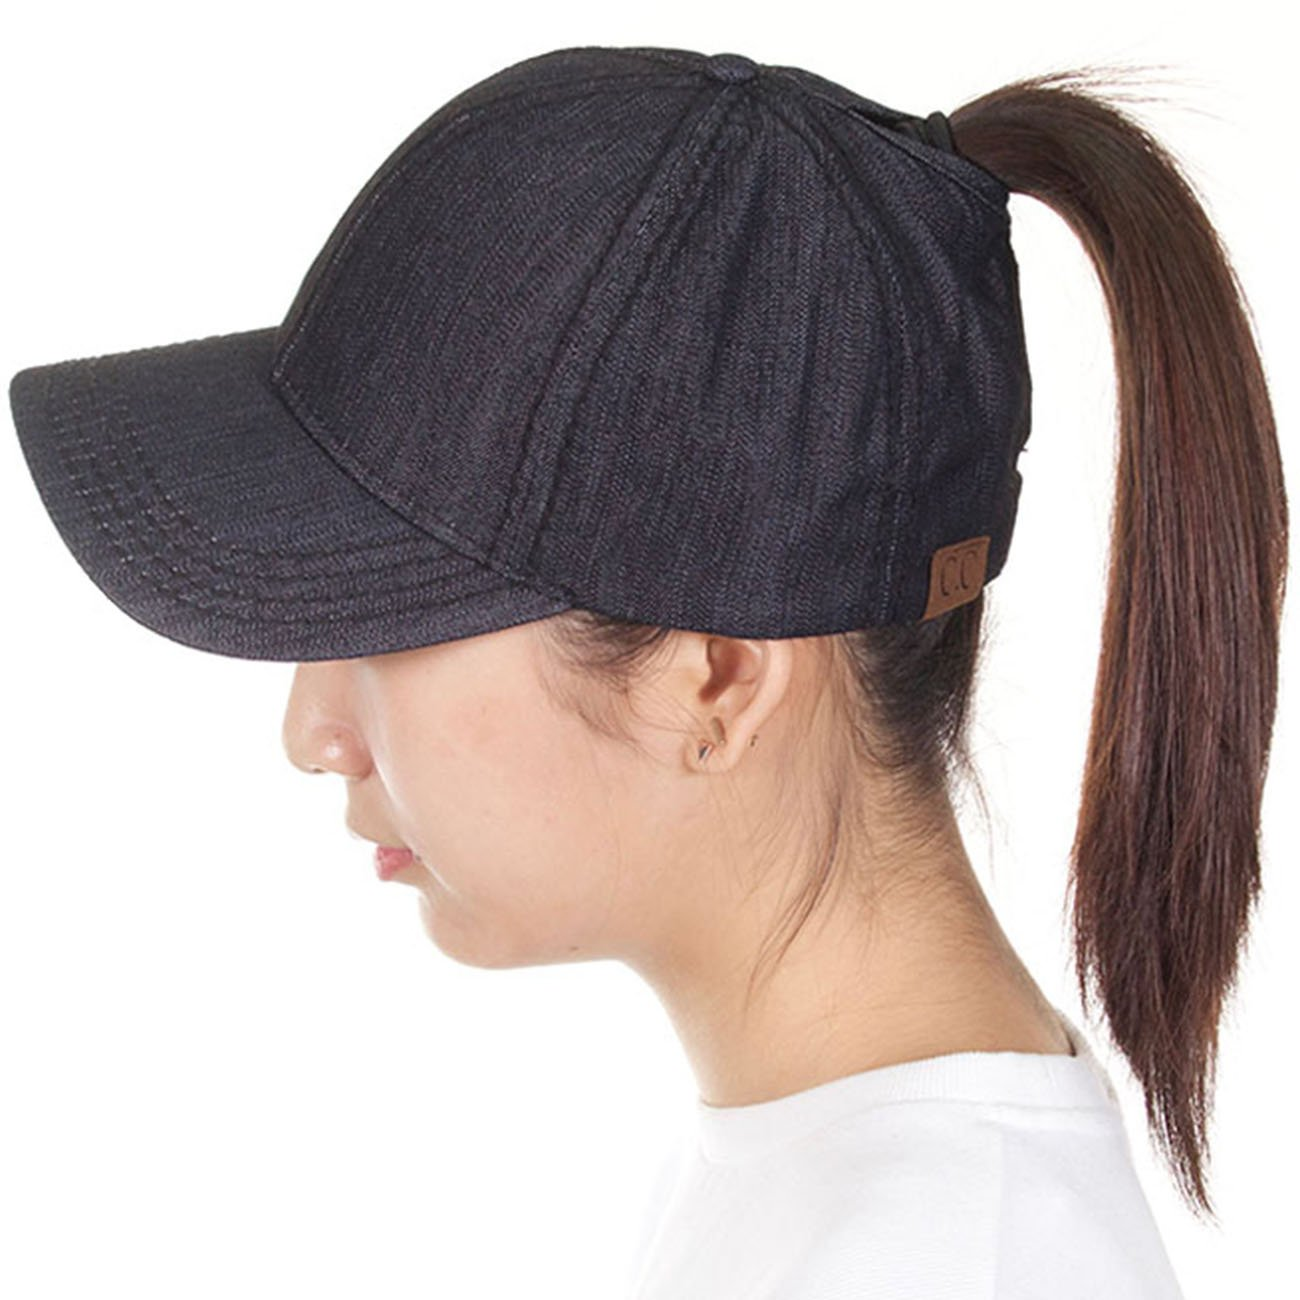 ScarvesMe C.C Solid Color Ponytail Messy Bun Ponycap Baseball Cap (Black)